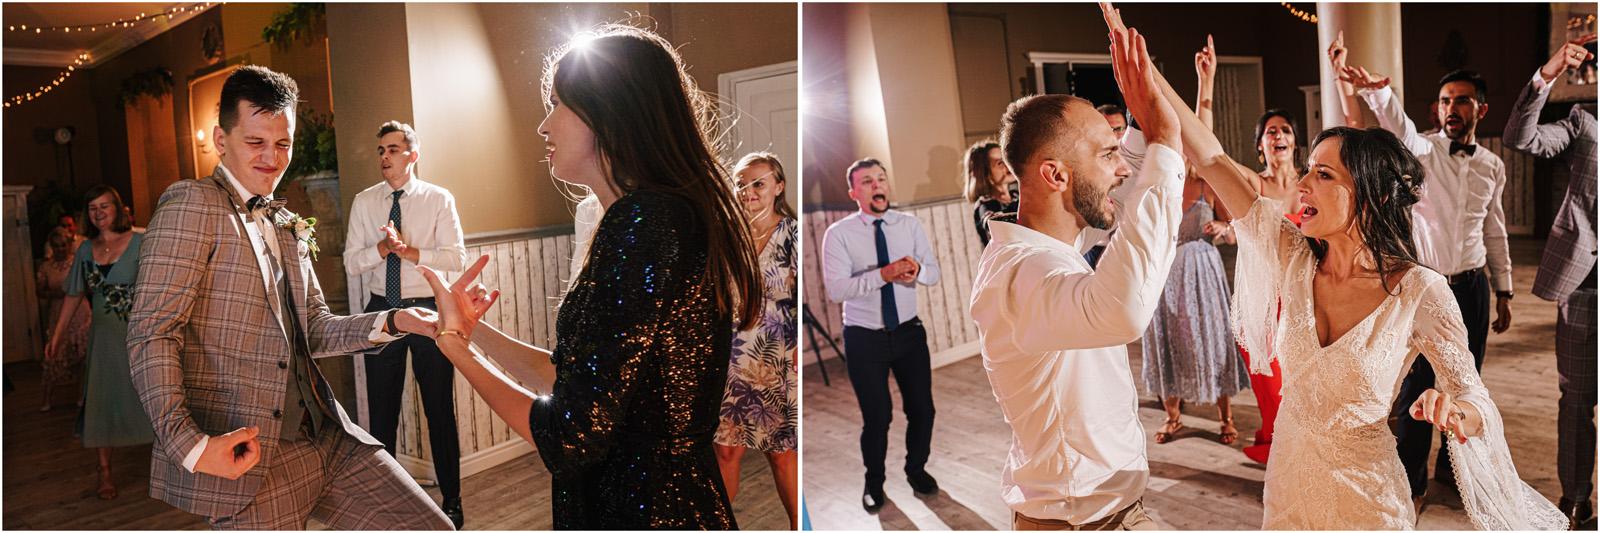 Ania & Mateusz | boho wesele w Stodole pod Kasztanami 121